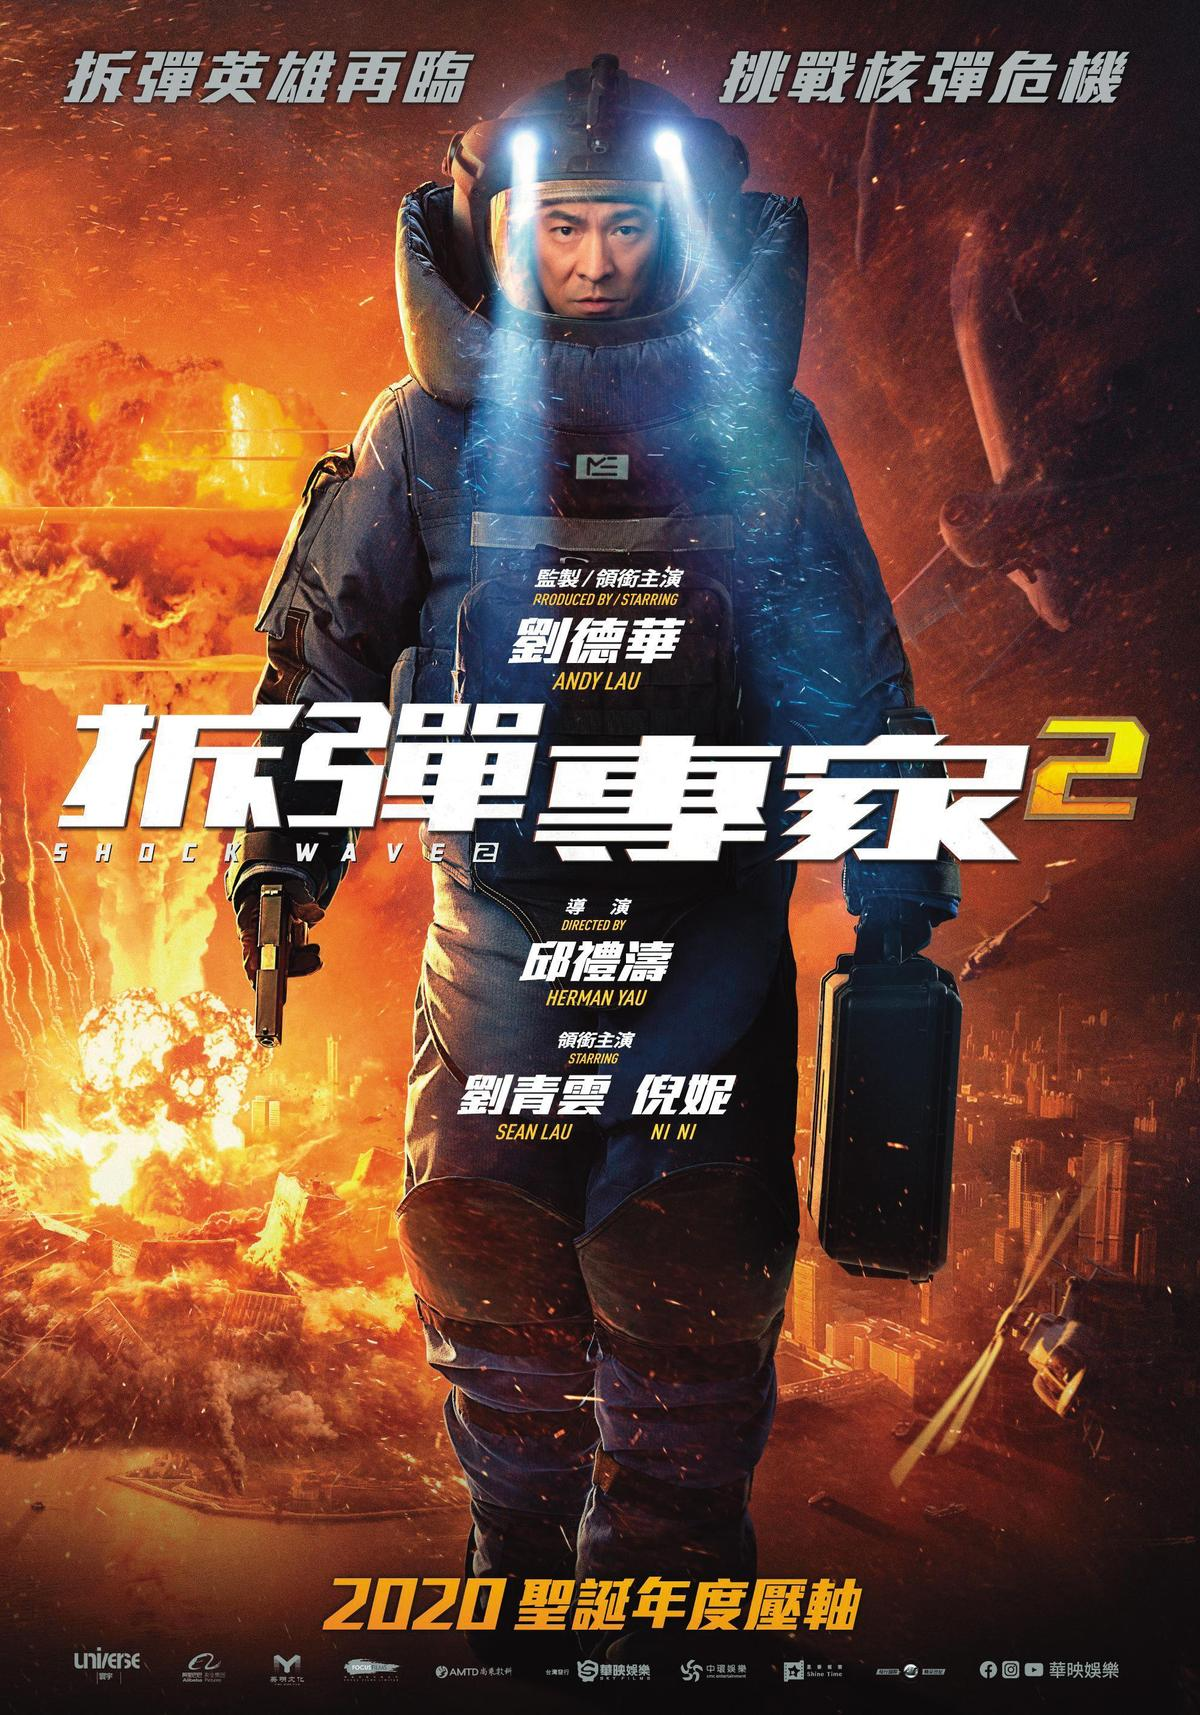 拆弹专家2《Shock Wave 2》(华映提供)